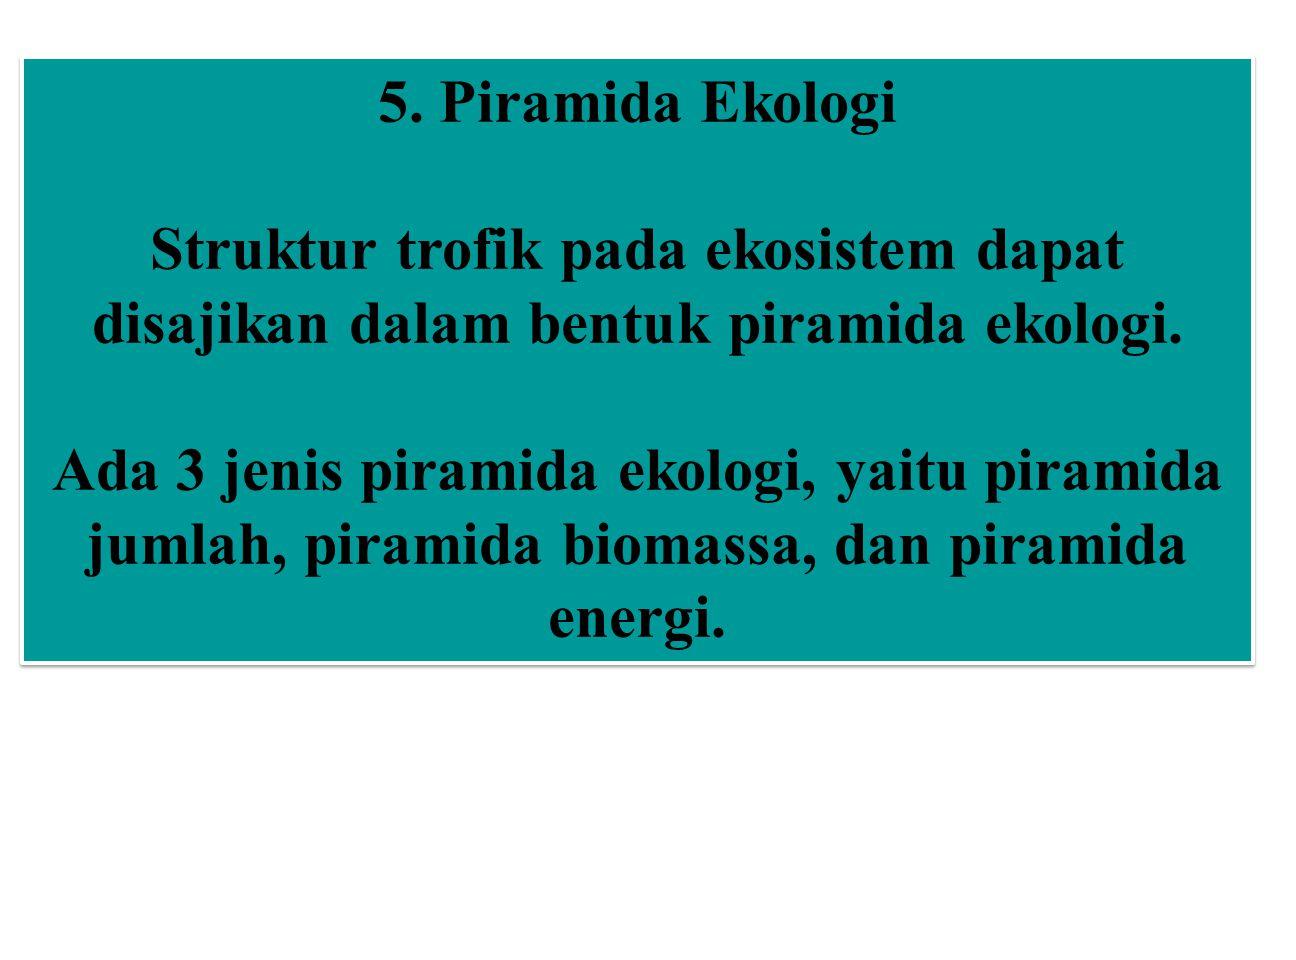 5. Piramida Ekologi Struktur trofik pada ekosistem dapat disajikan dalam bentuk piramida ekologi. Ada 3 jenis piramida ekologi, yaitu piramida jumlah,